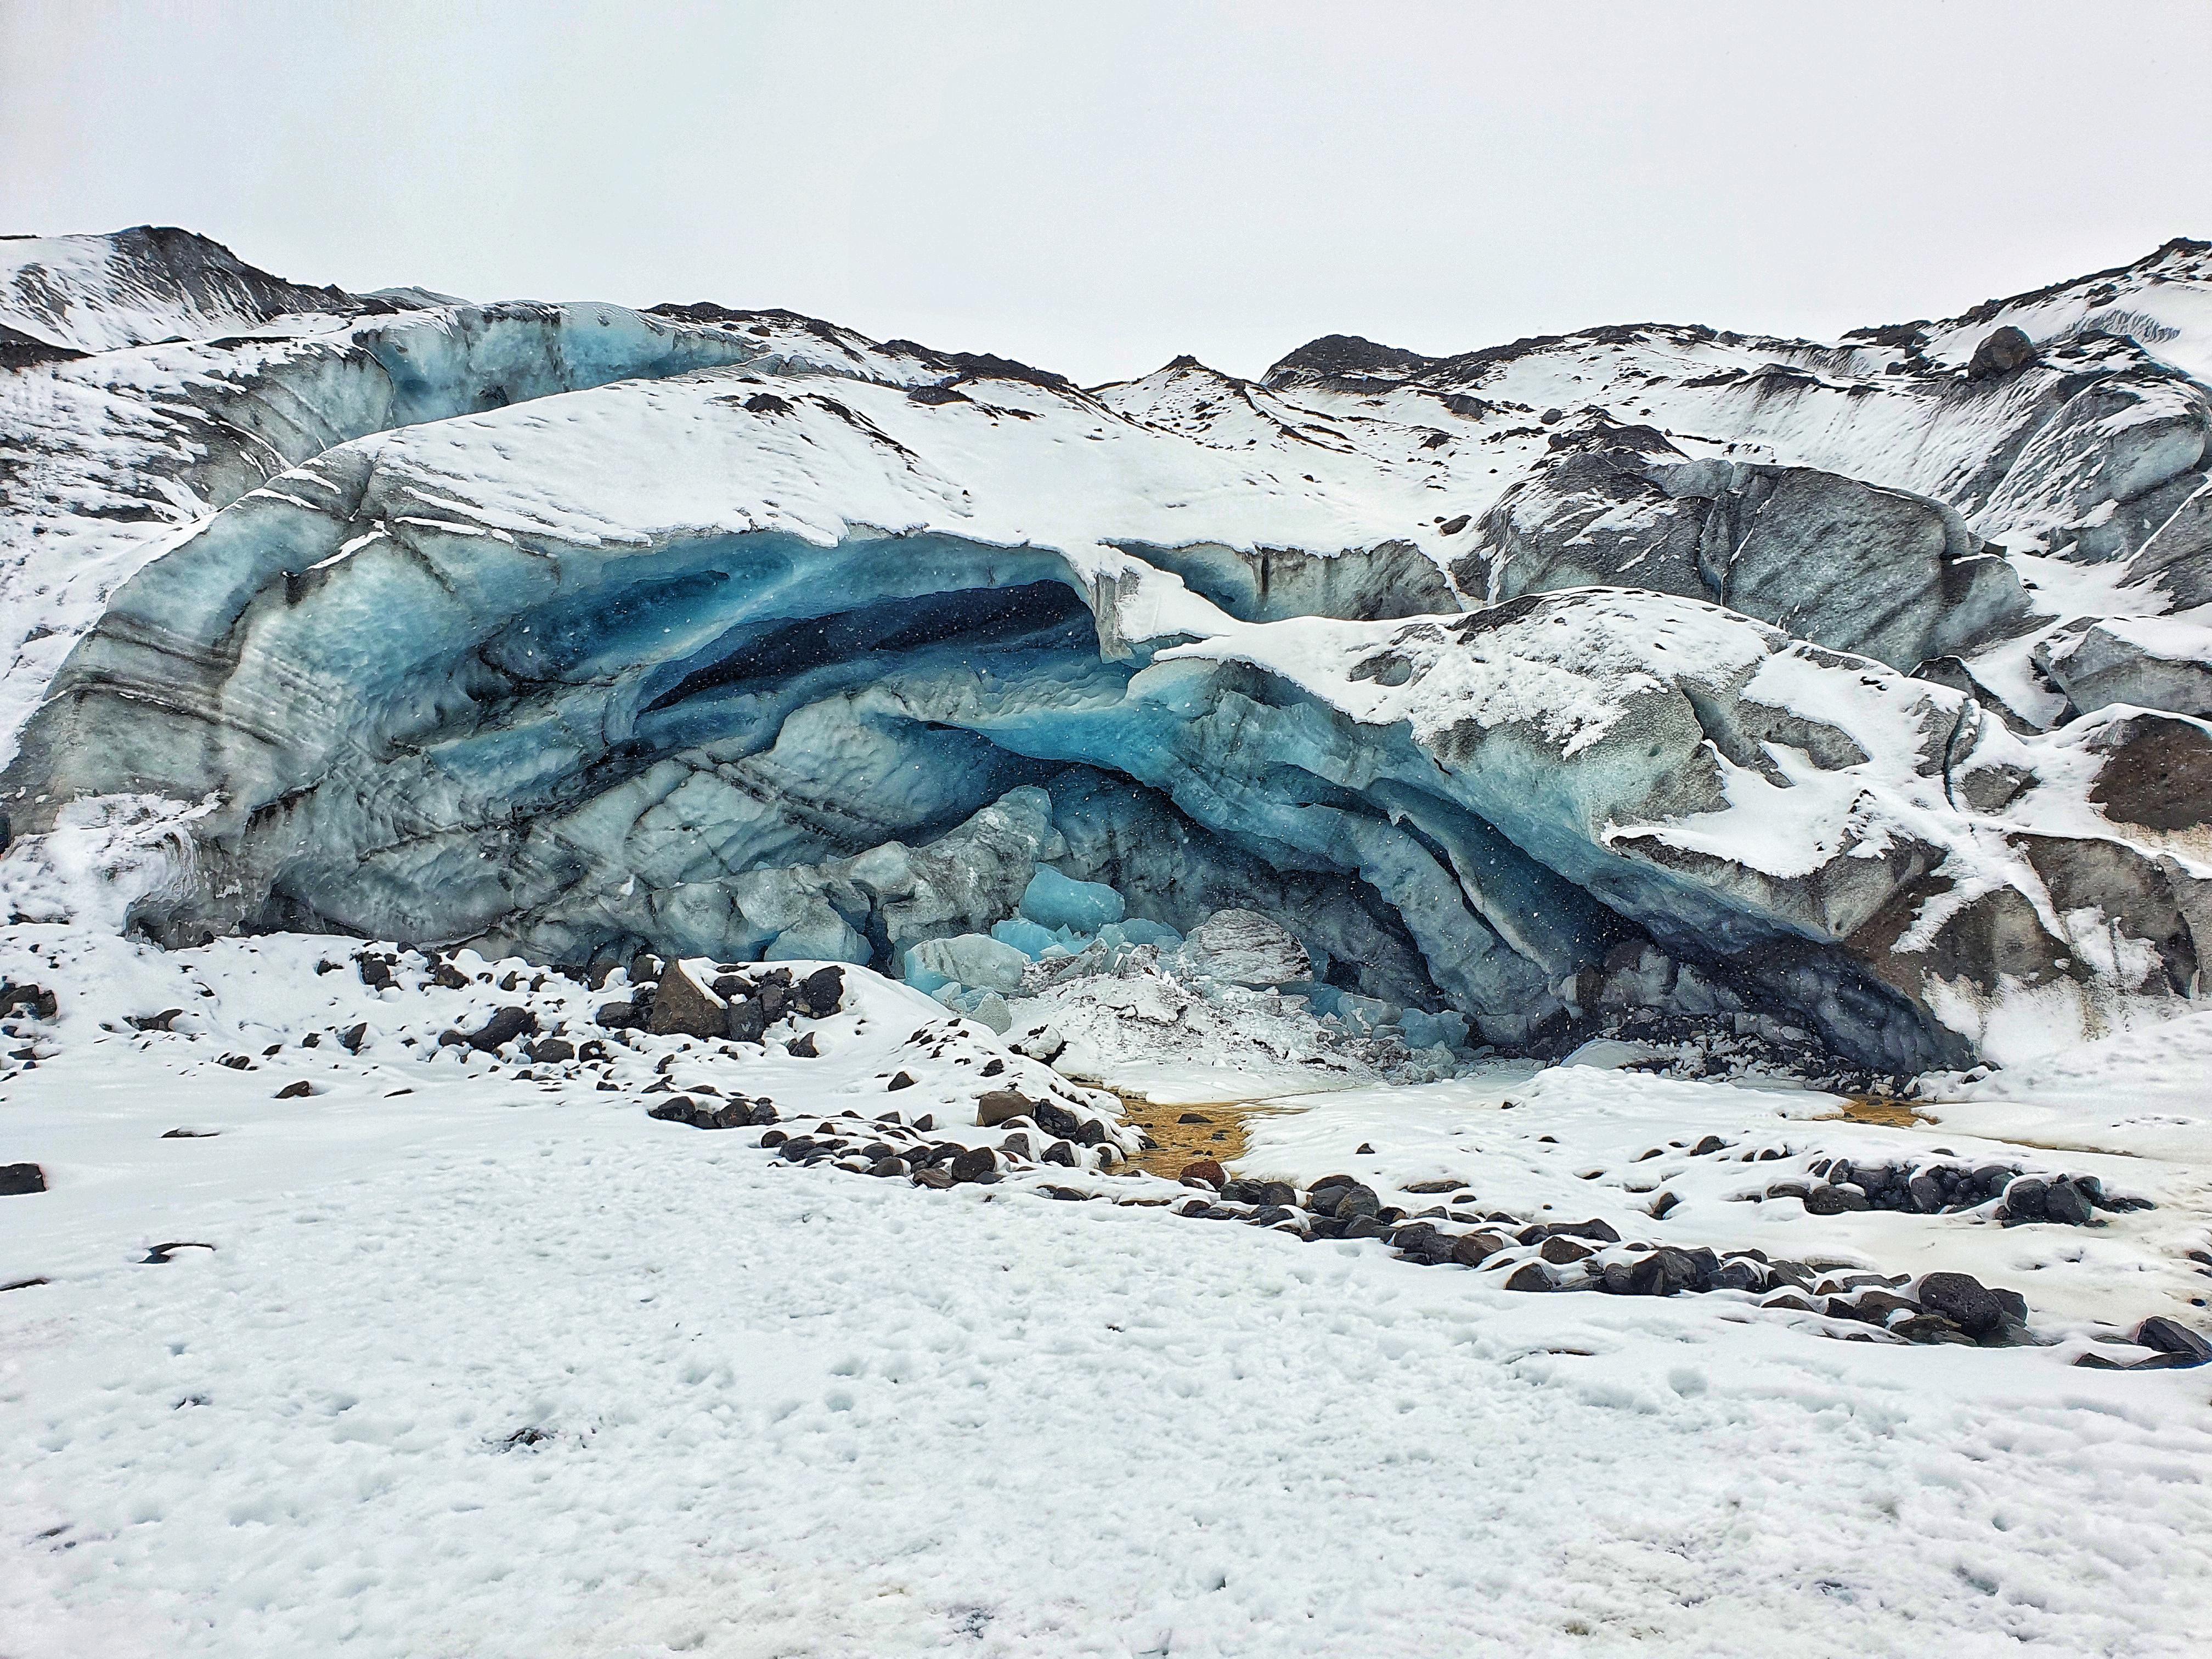 Jökulsárlón Iceland [OC] [1920x1080] LaurenTahnia https